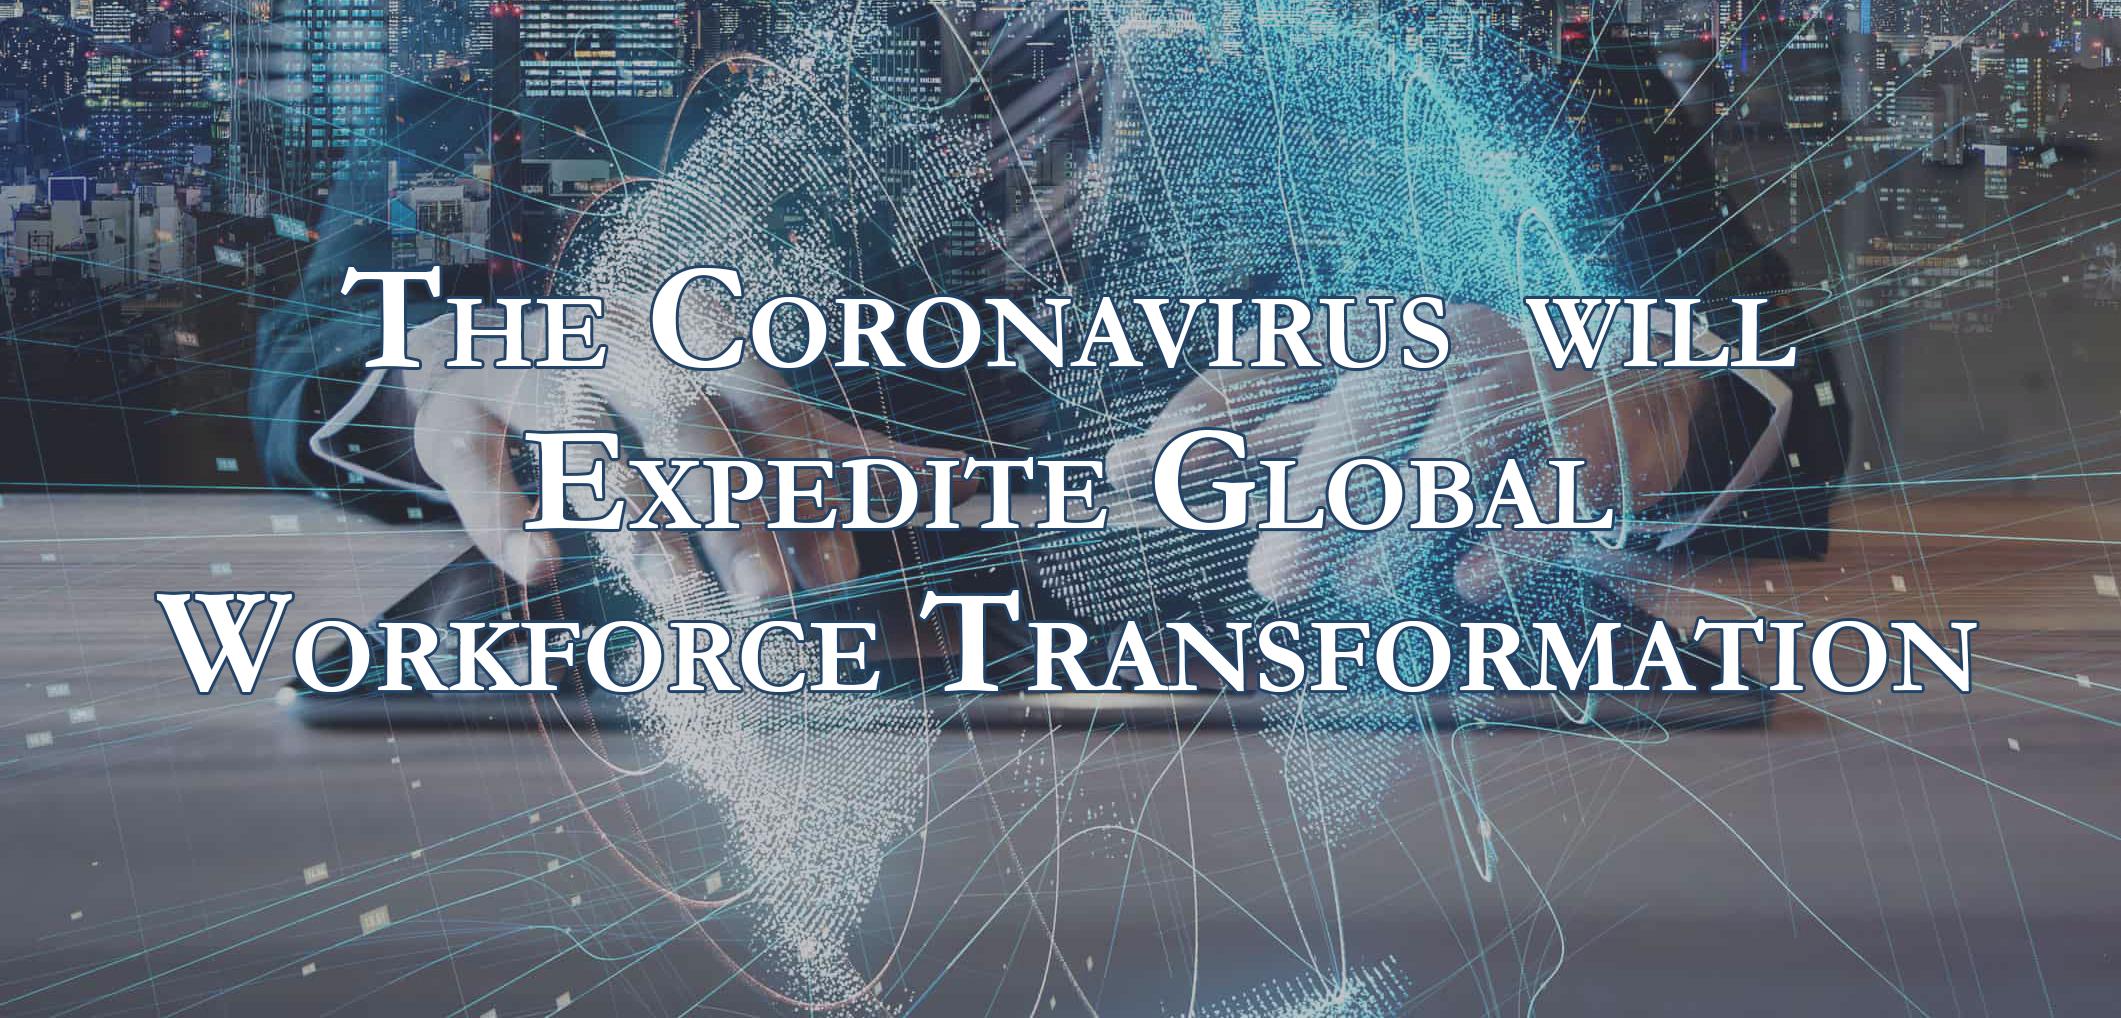 The Coronavirus will Expedite Global Workforce Transformation